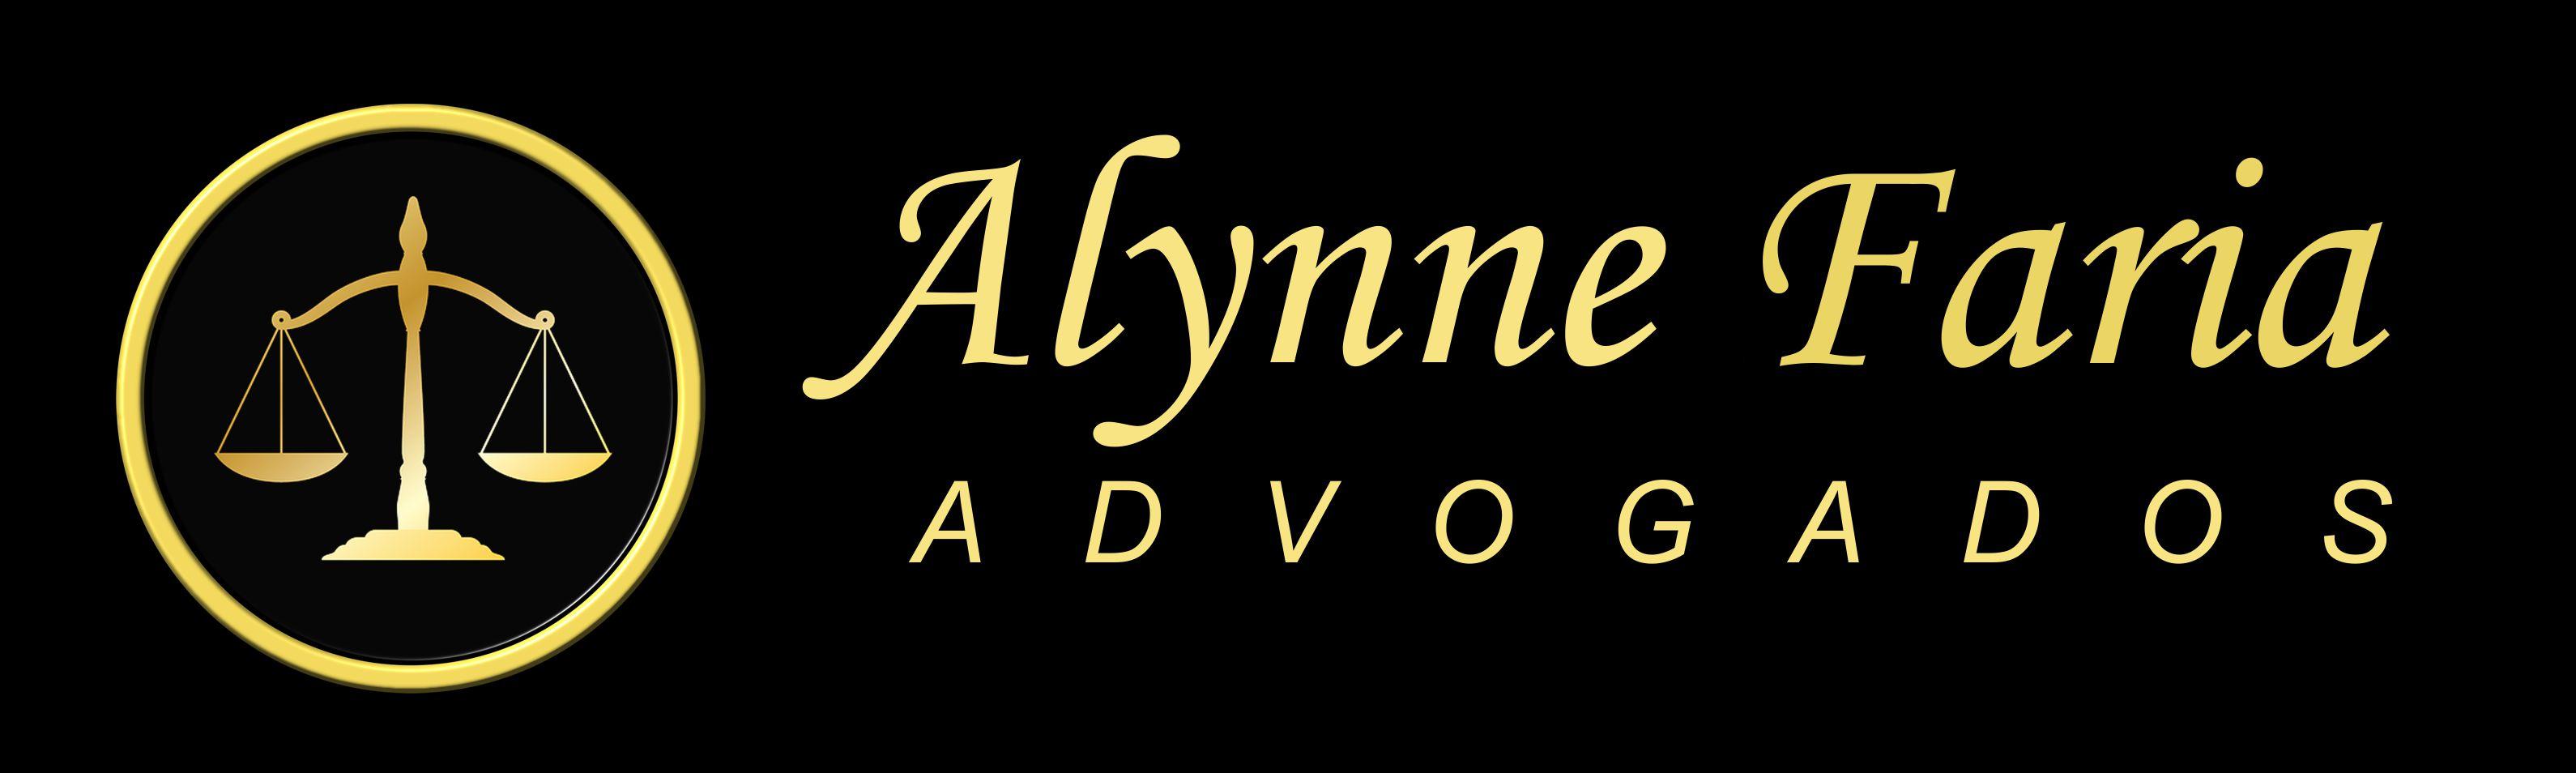 ALYNNE FARIA ADVOGADA – (21)3811-6887, Advogados, cível, trabalhista, consumidor , família